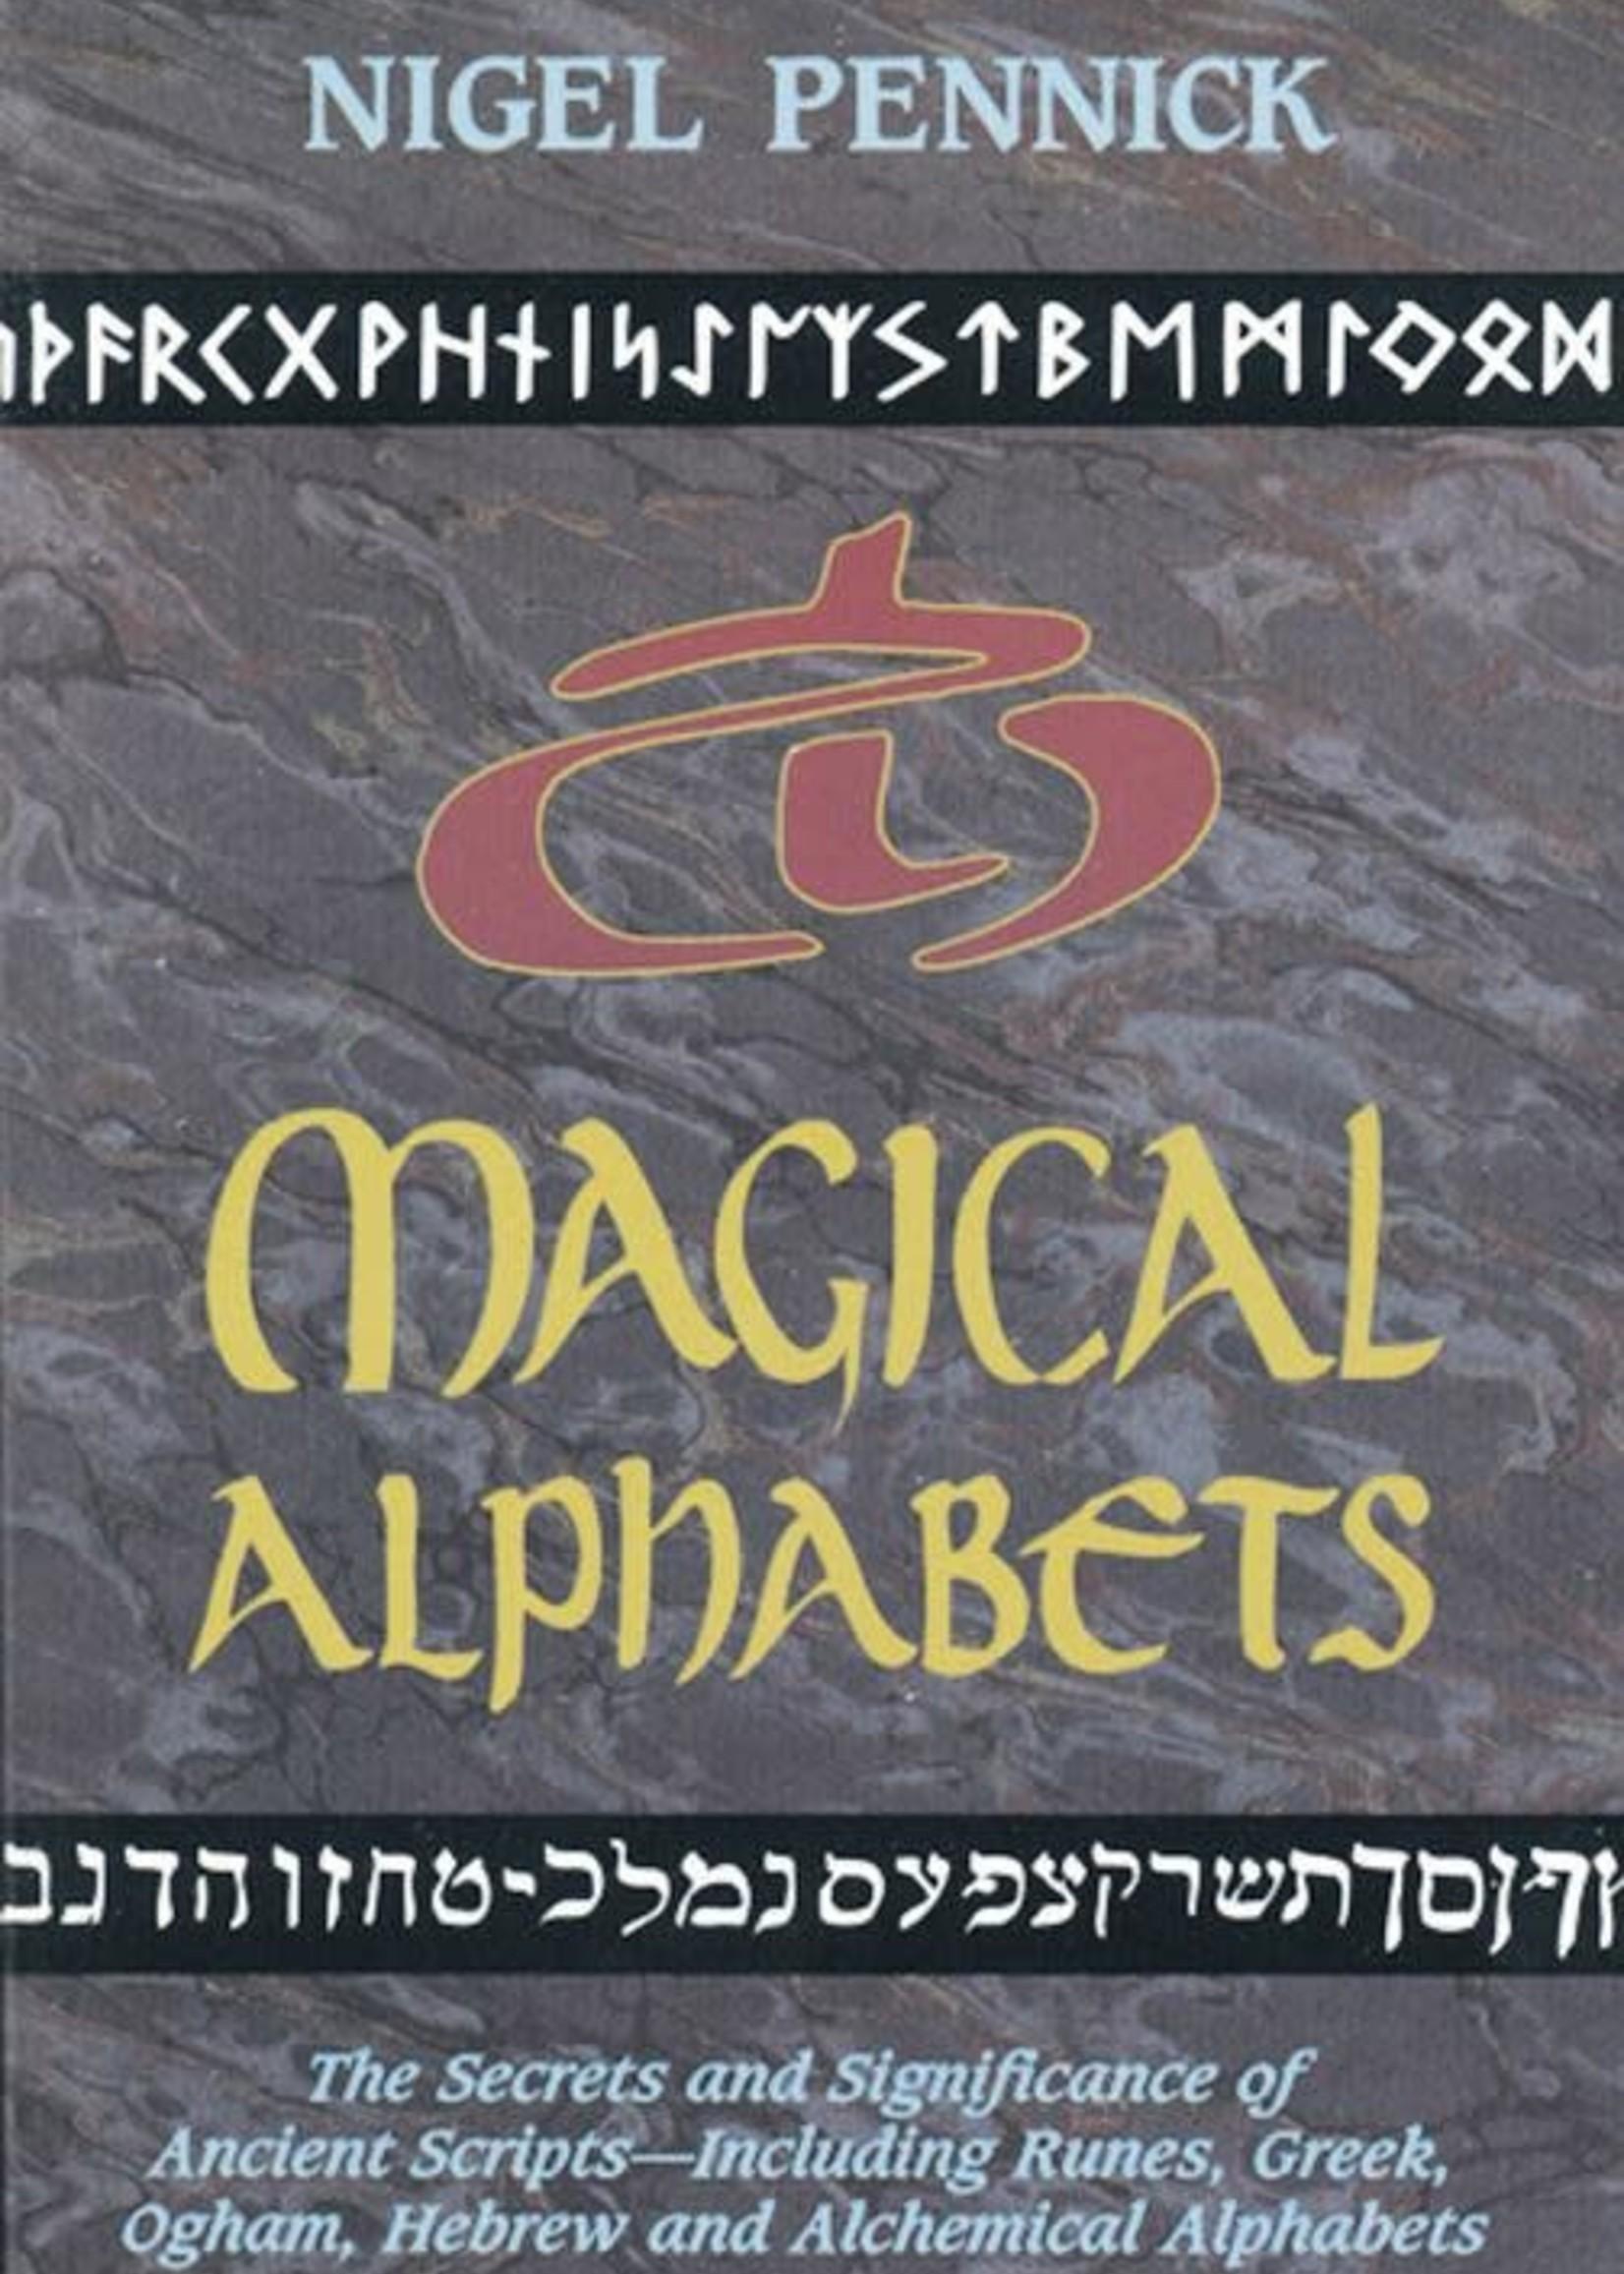 Magical Alphabets (Nigel Pennick)